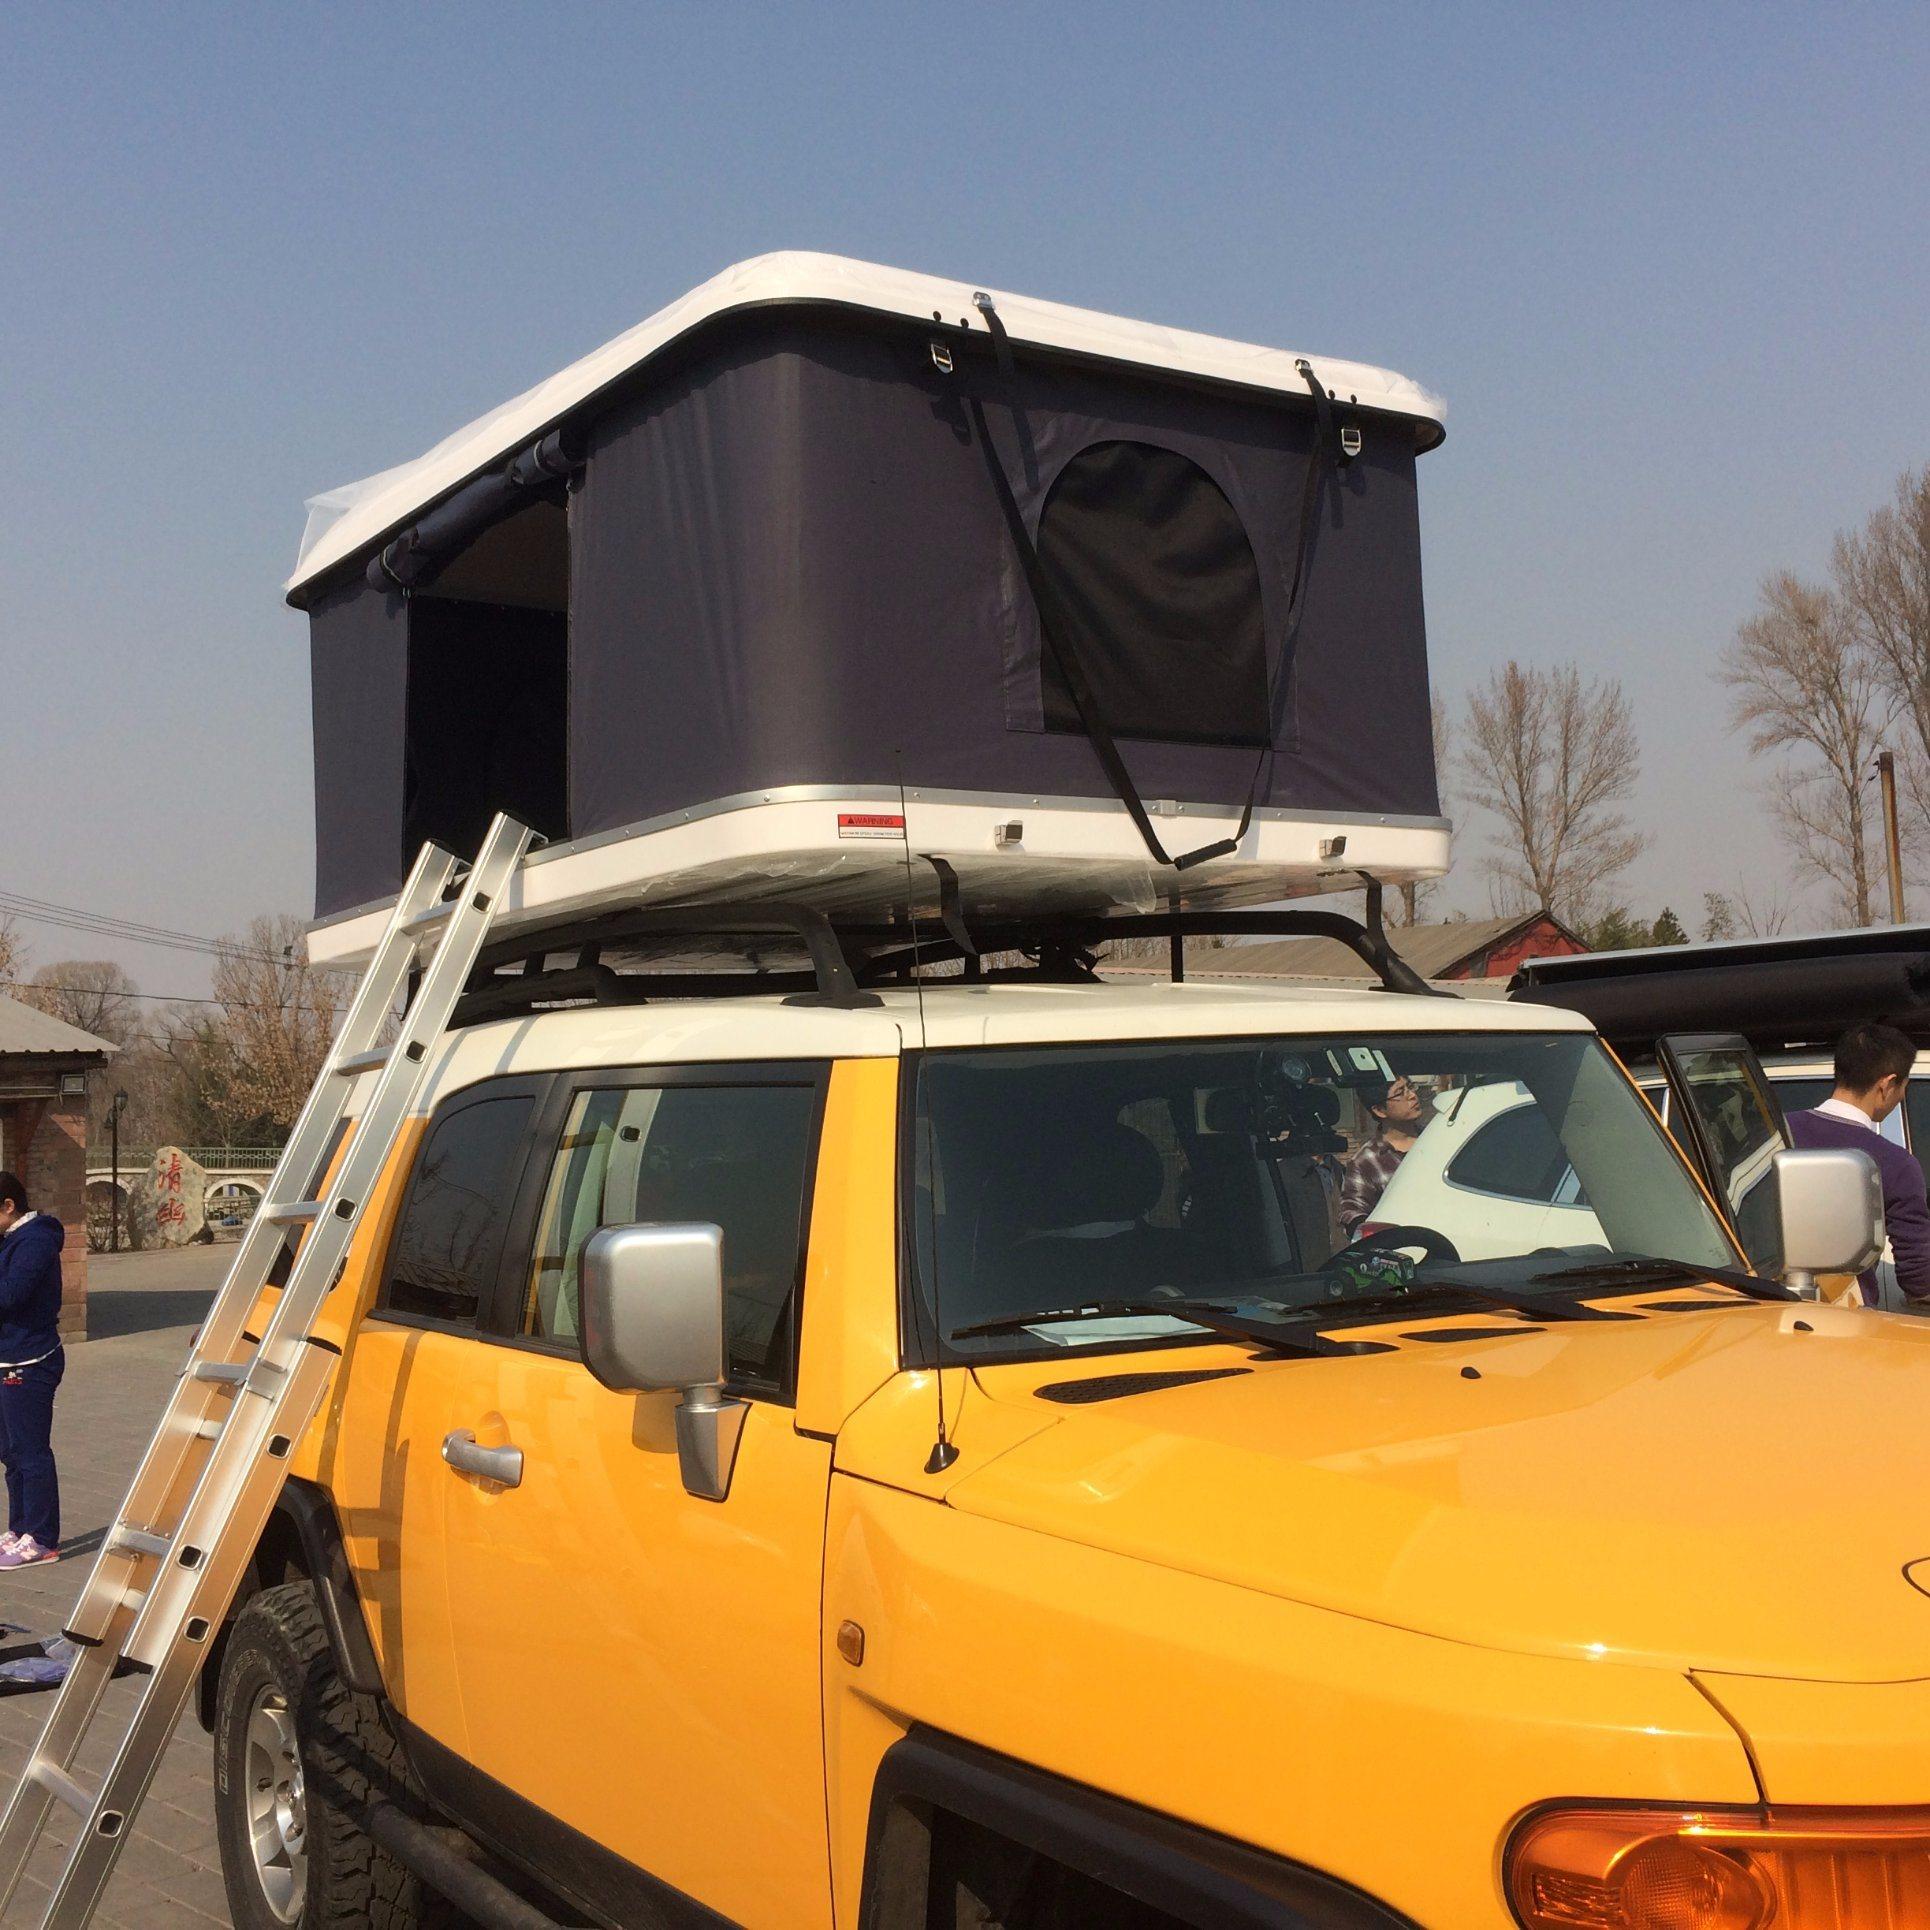 Cheap Camper Trailer Tent Yard And Photos Rockwood Wiring Schematic Travel Diagram Schematics Diagrams